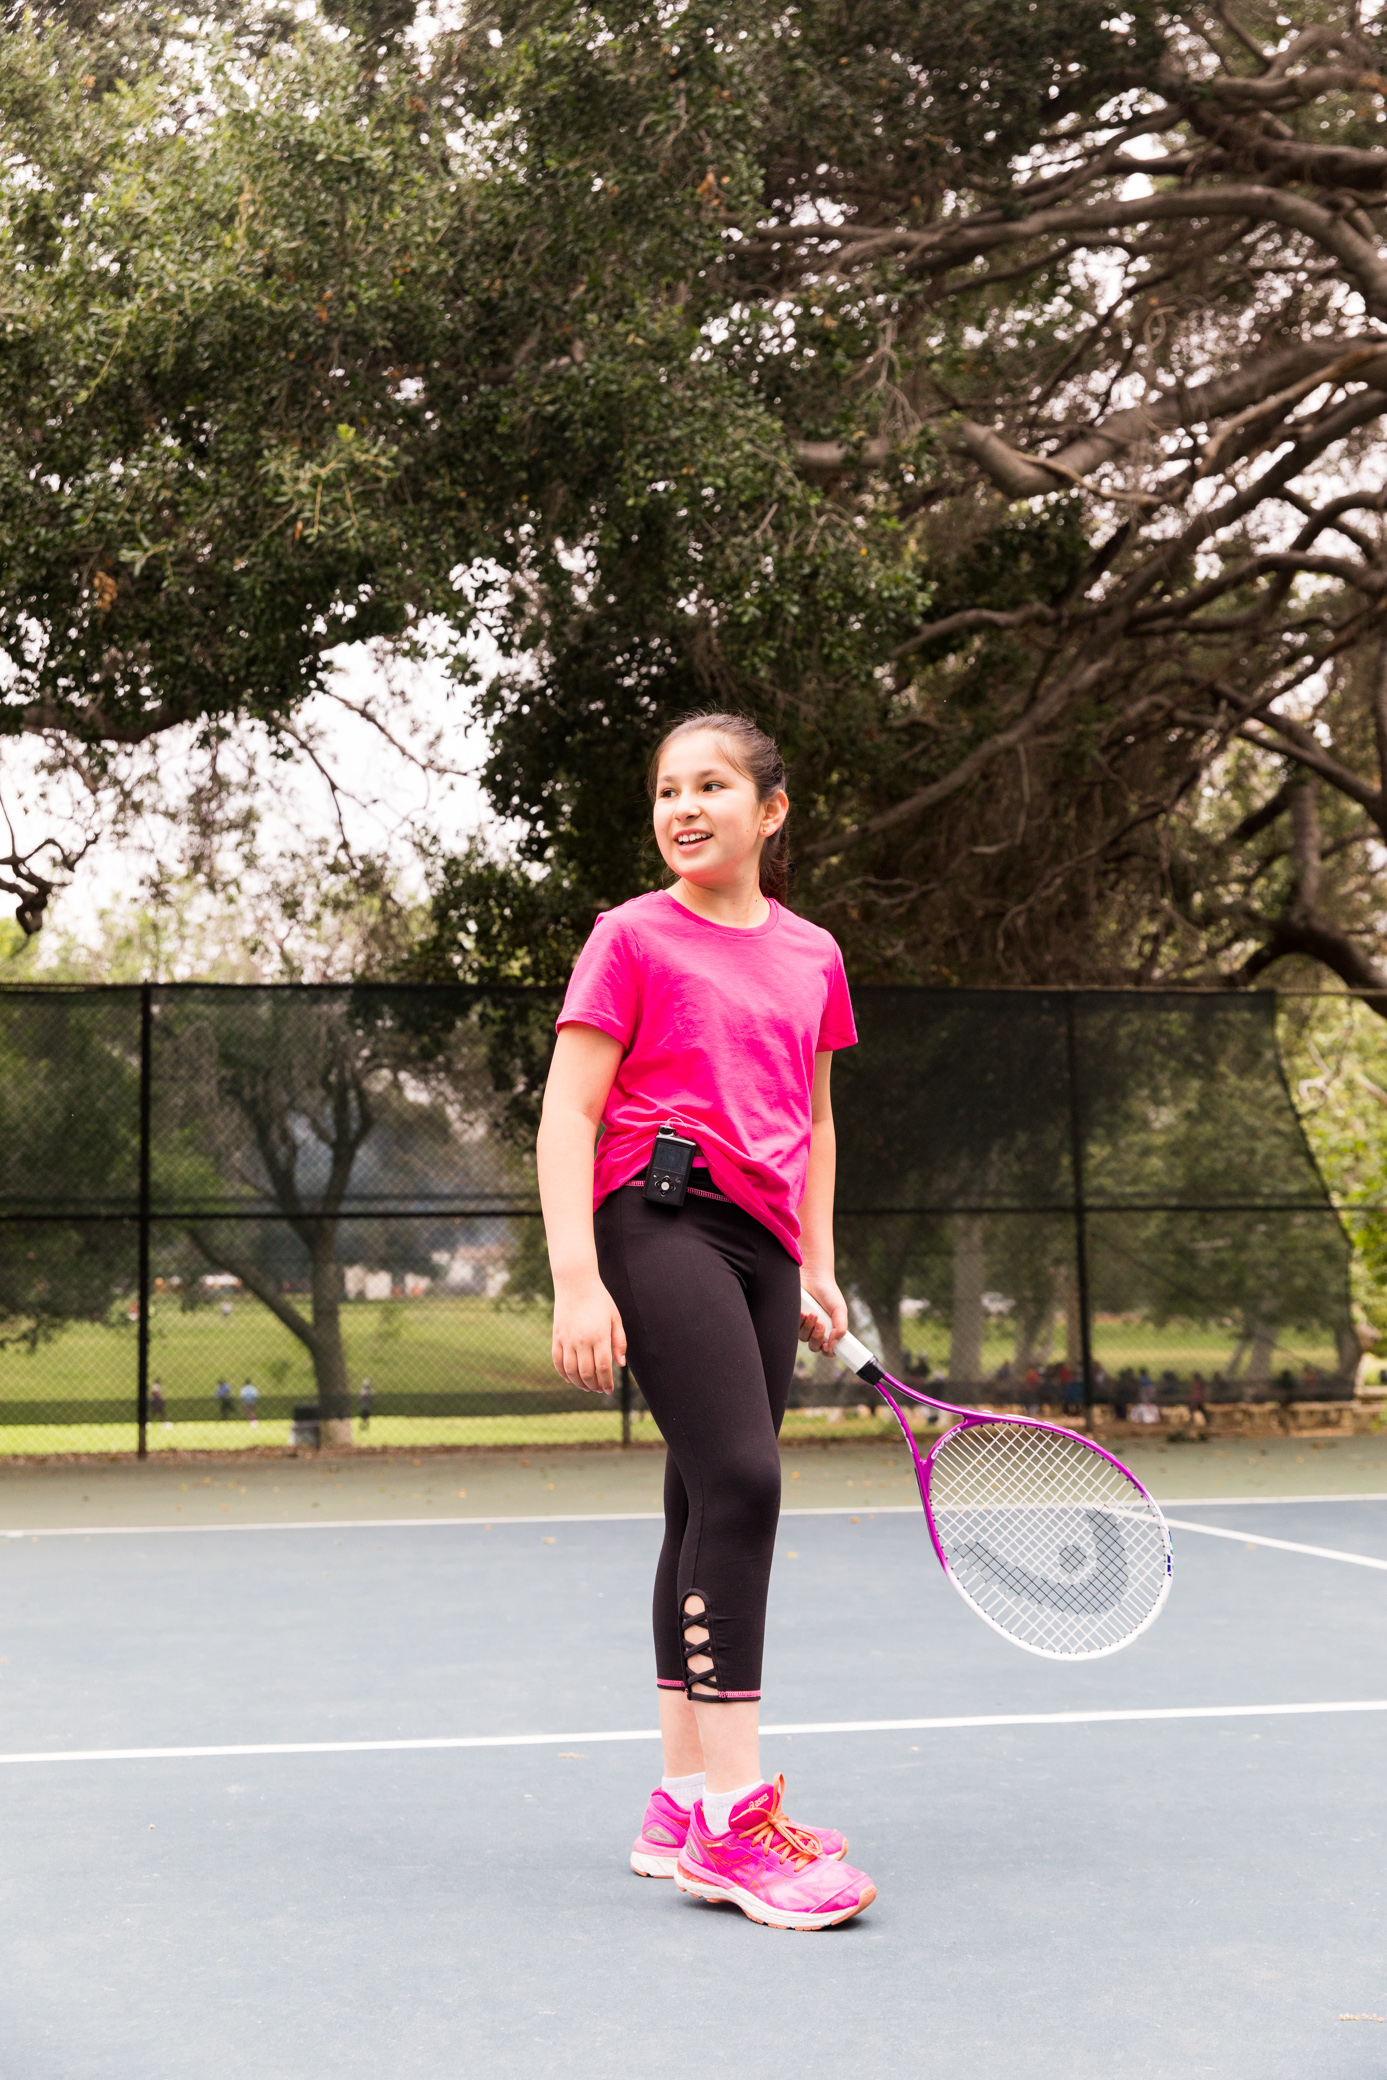 Medtronic-LA-Tennis-007.jpg